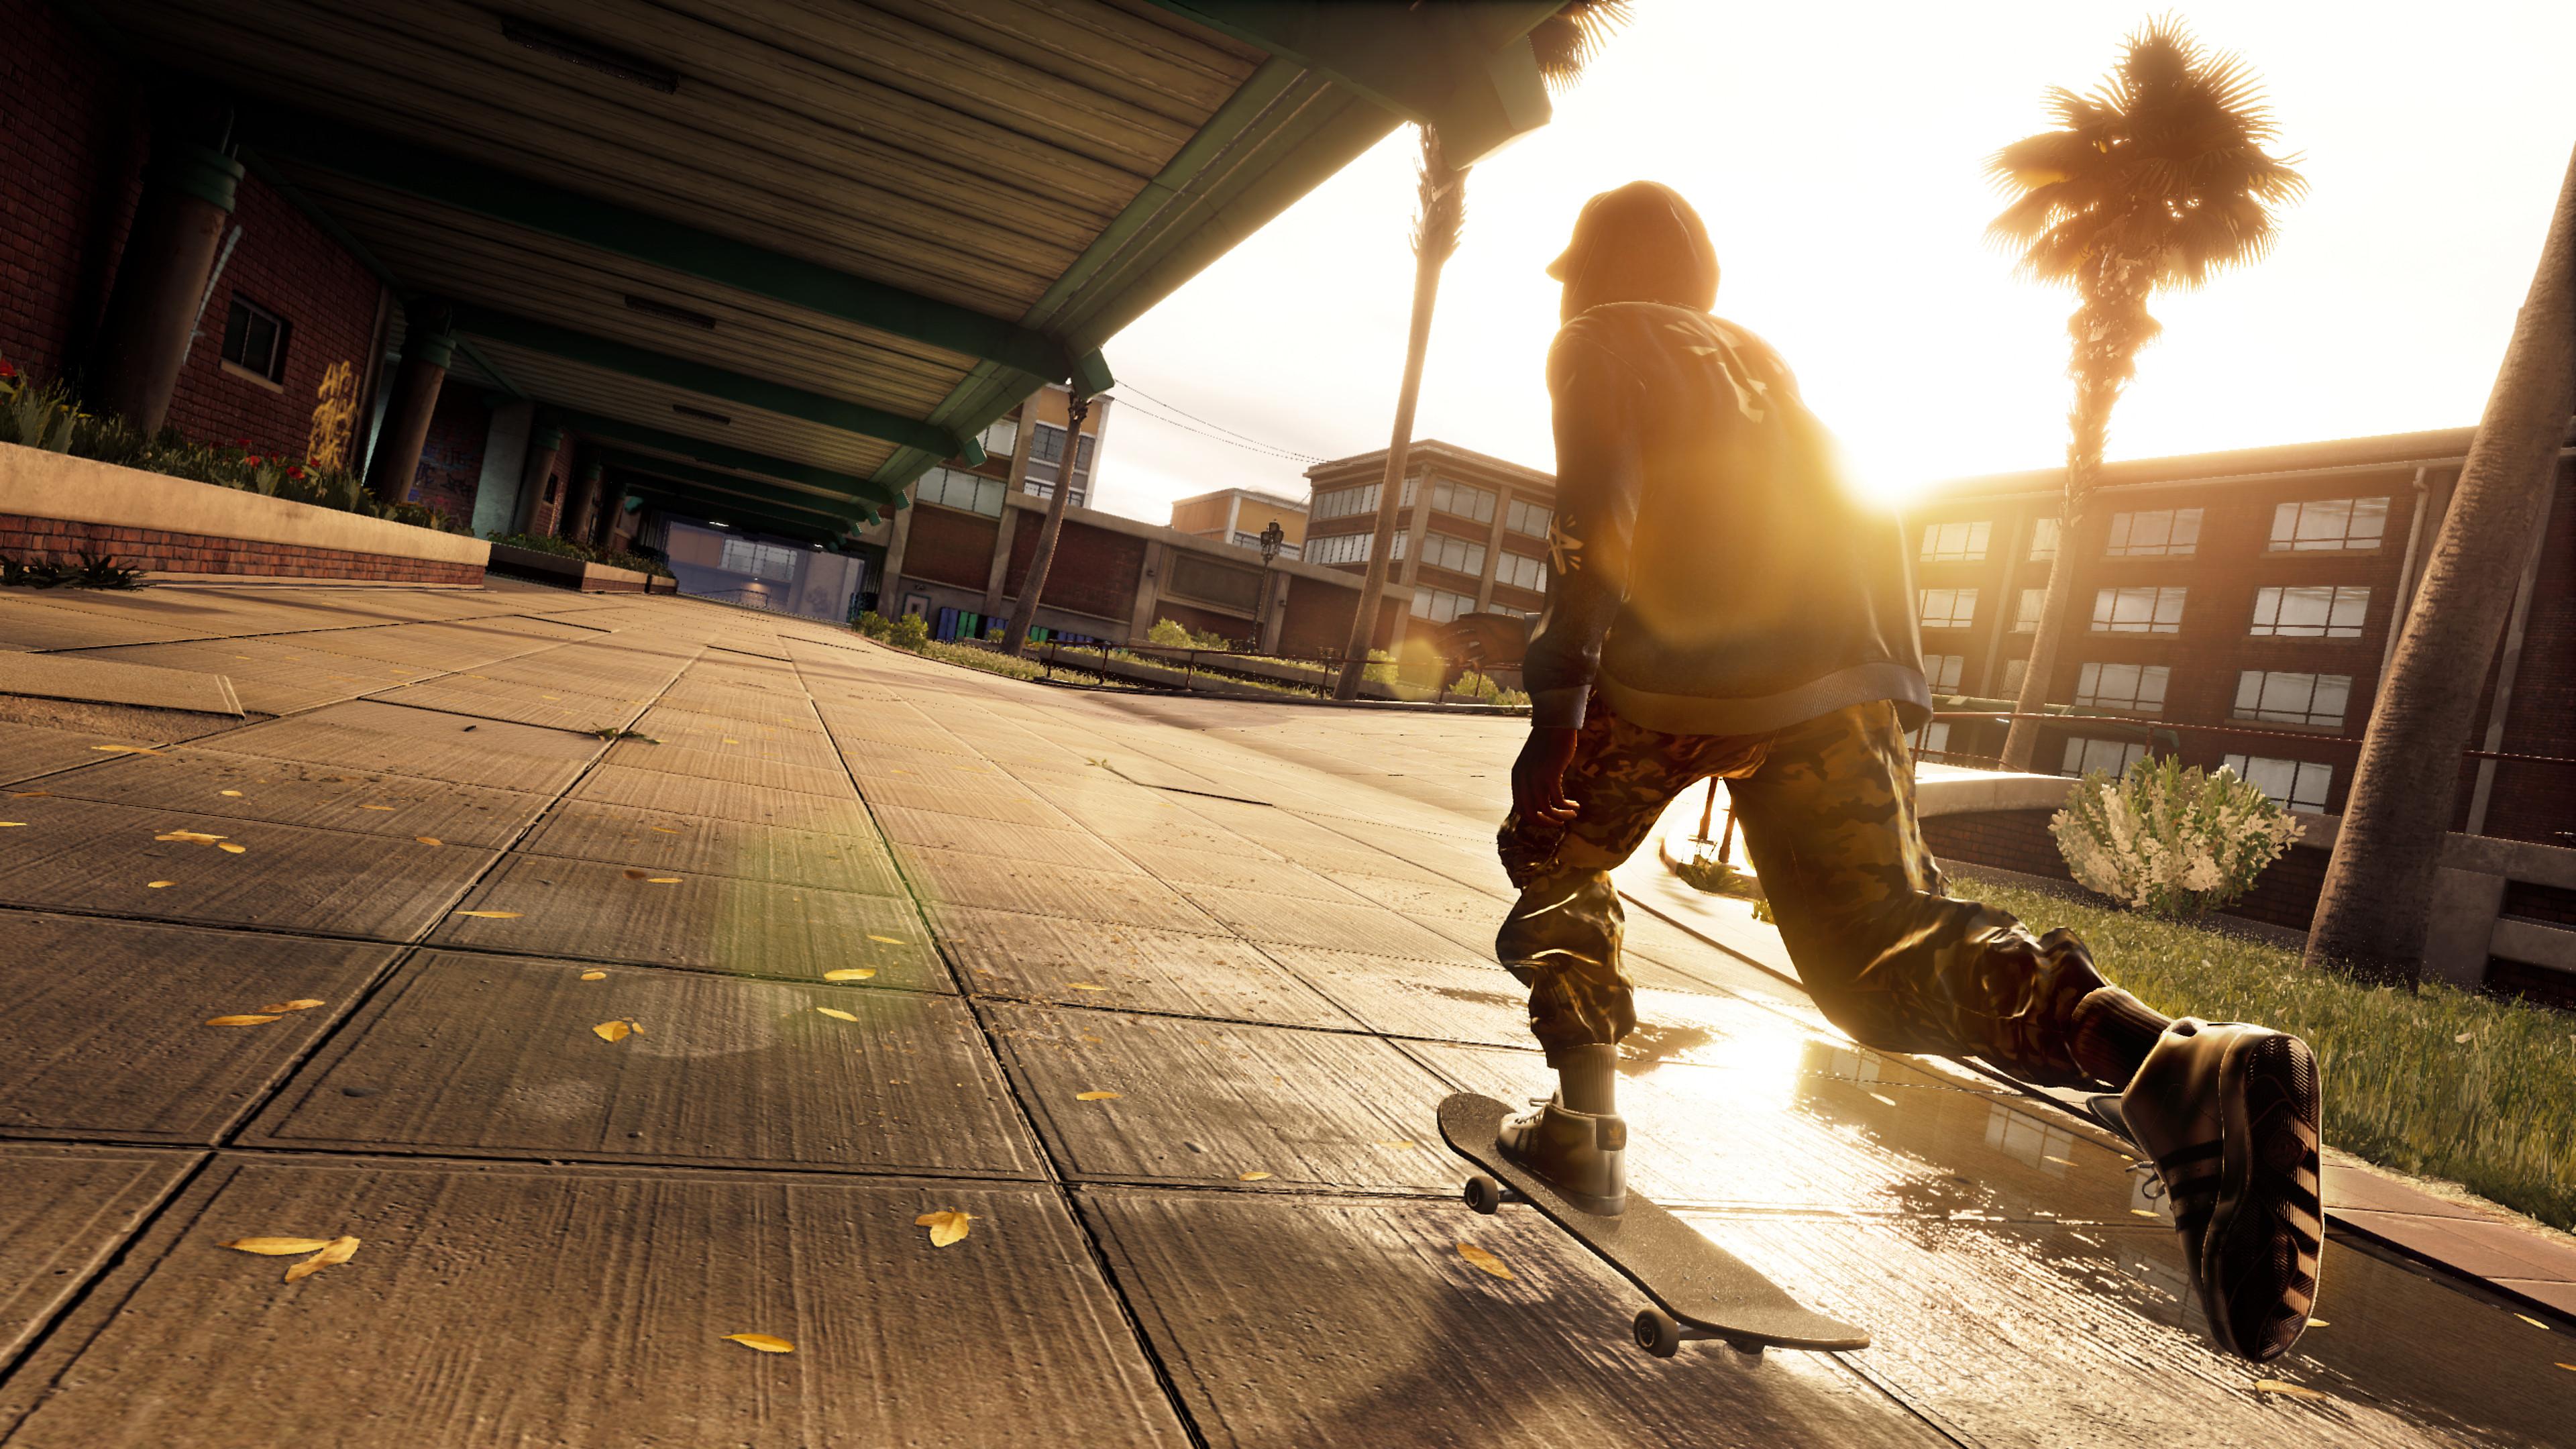 Tony Hawk's™ Pro Skater™ 1 + 2 Game | PS4 - PlayStation